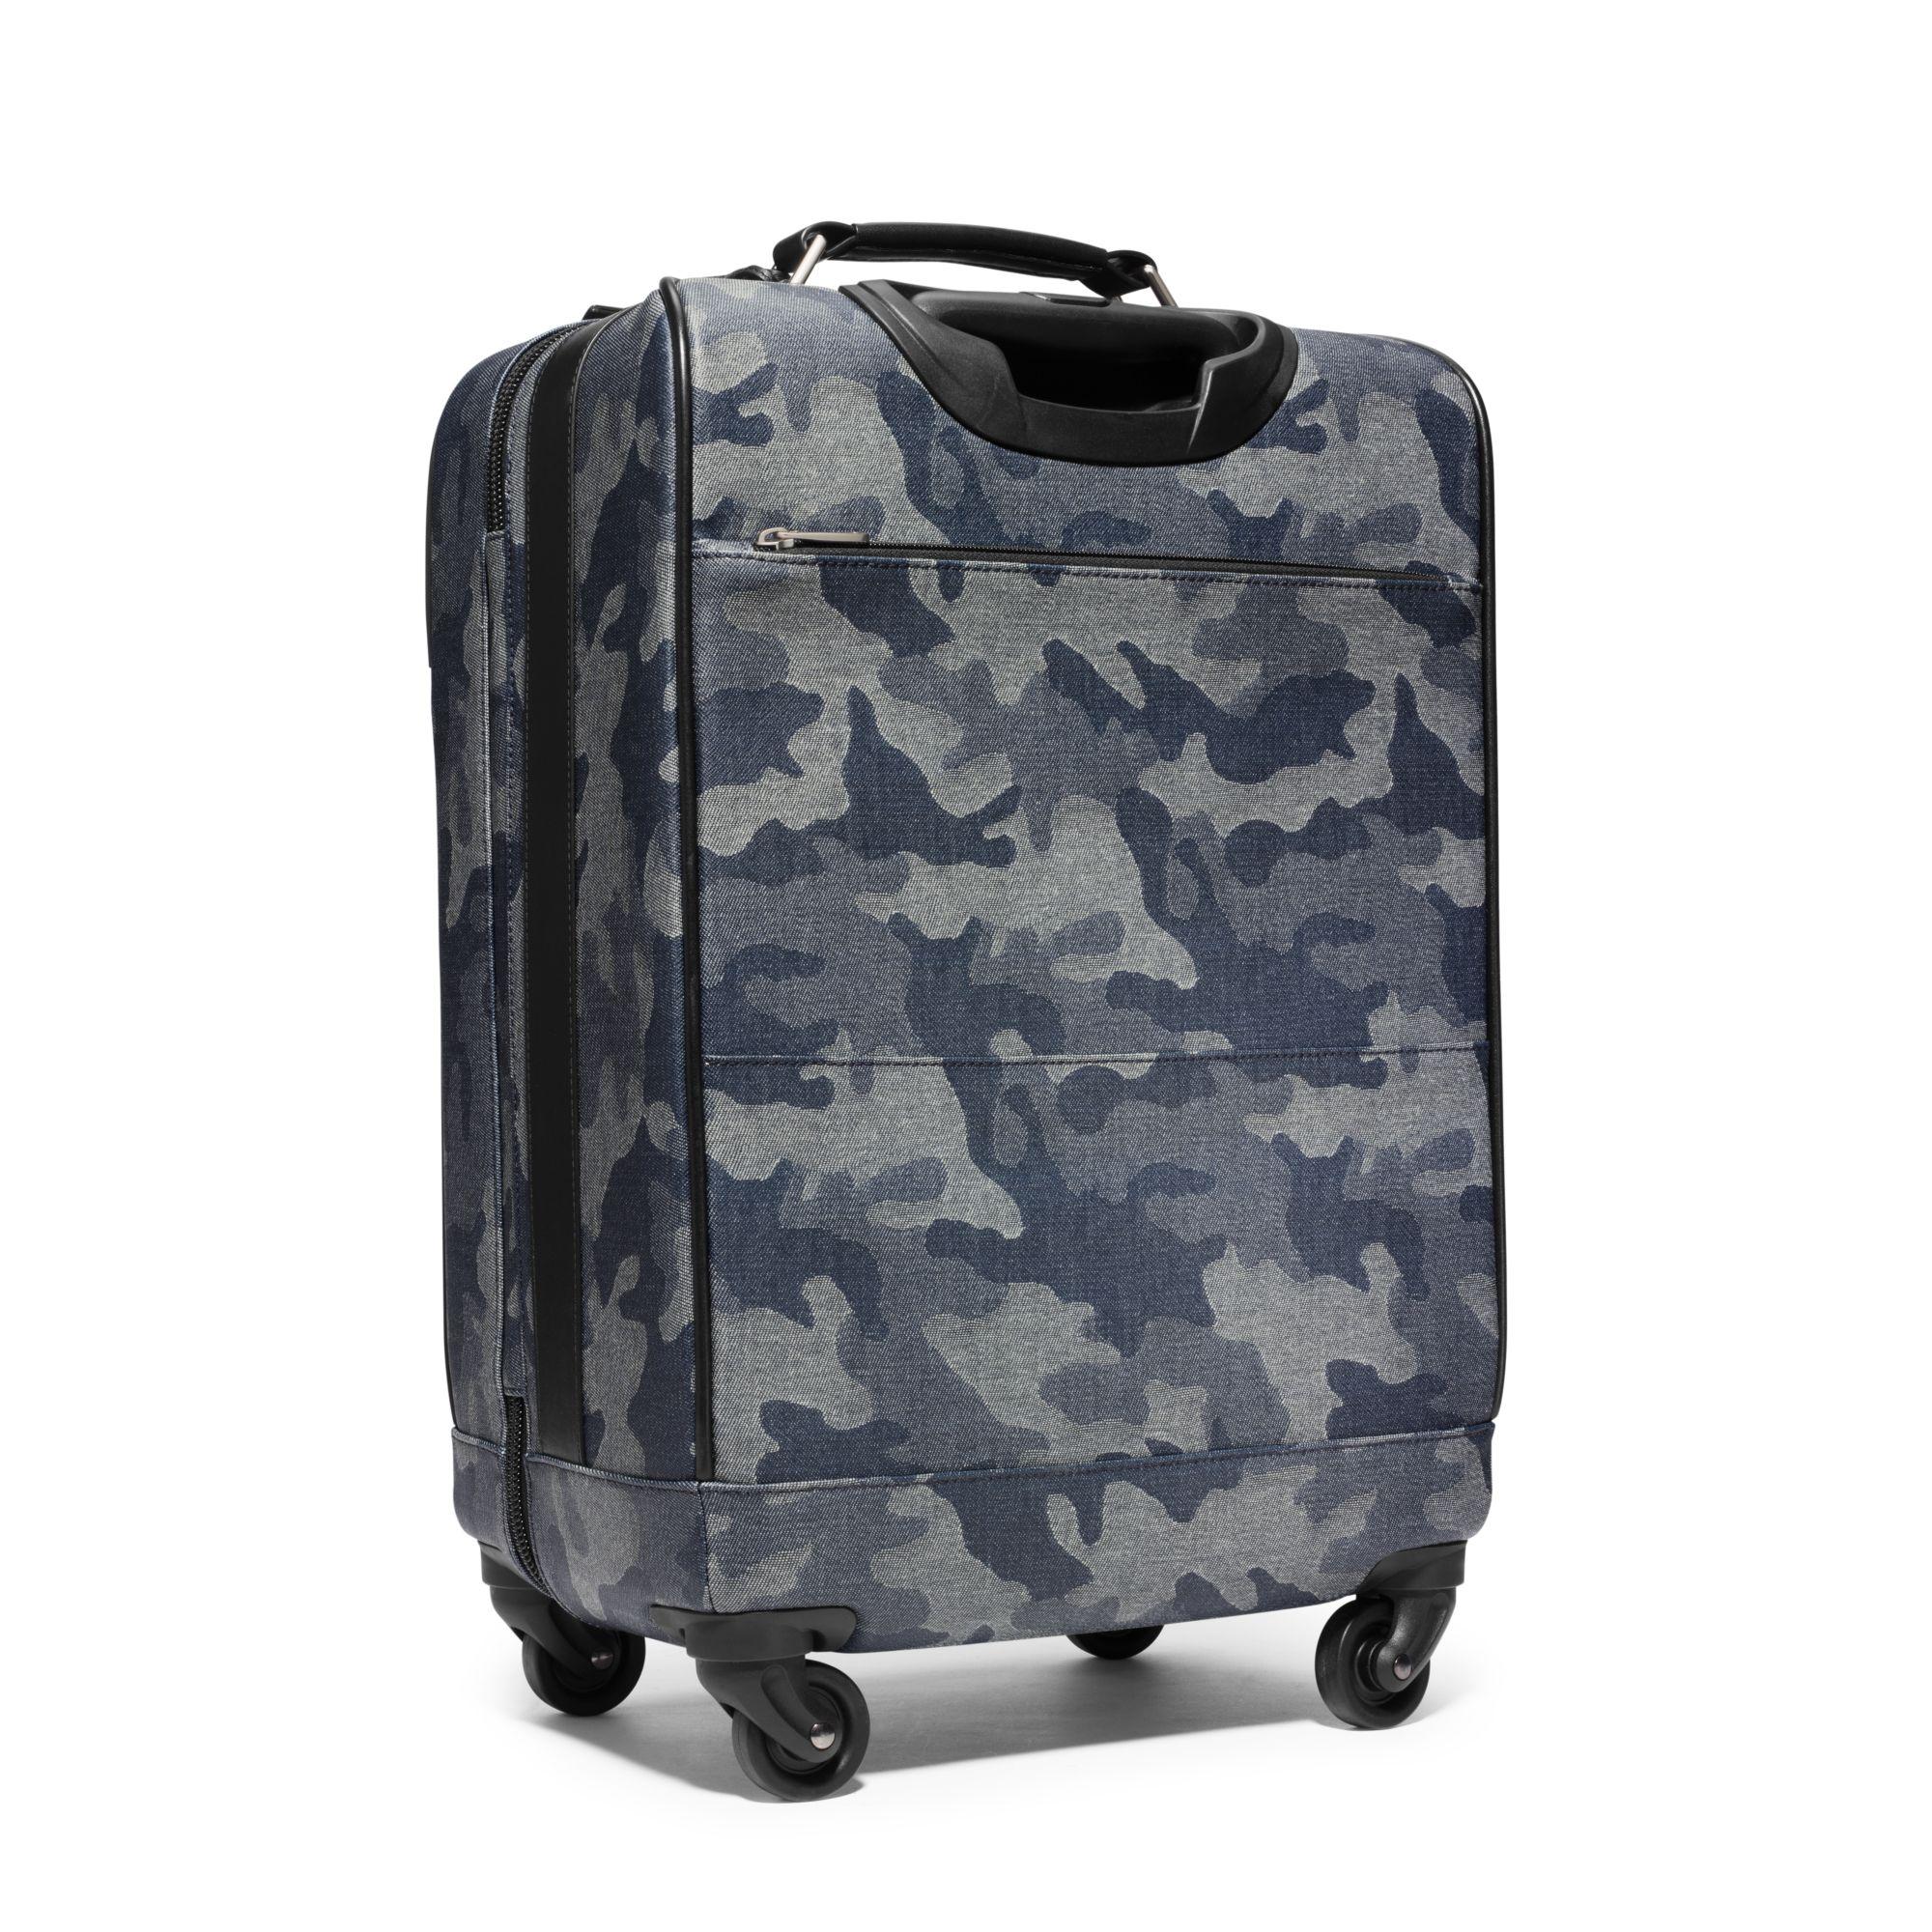 ffd7047cf3 Lyst - Michael Kors Jet Set Travel Denim Camouflage Suitcase in Blue ...